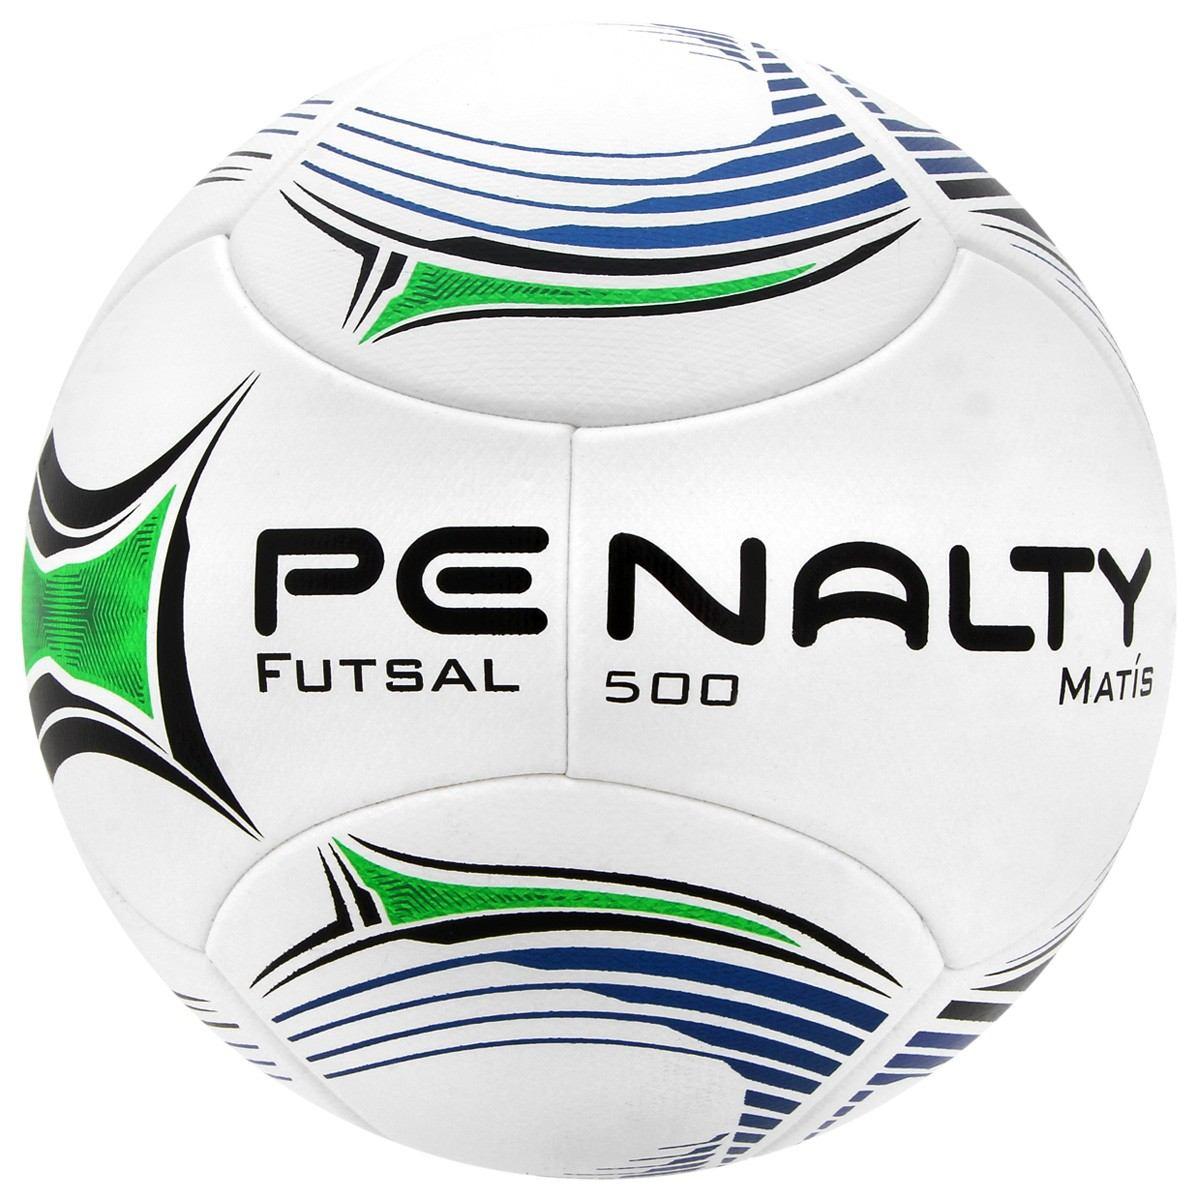 dfa89d2a9a0fc Bola Penalty Matis 500 - Futsal - R  90